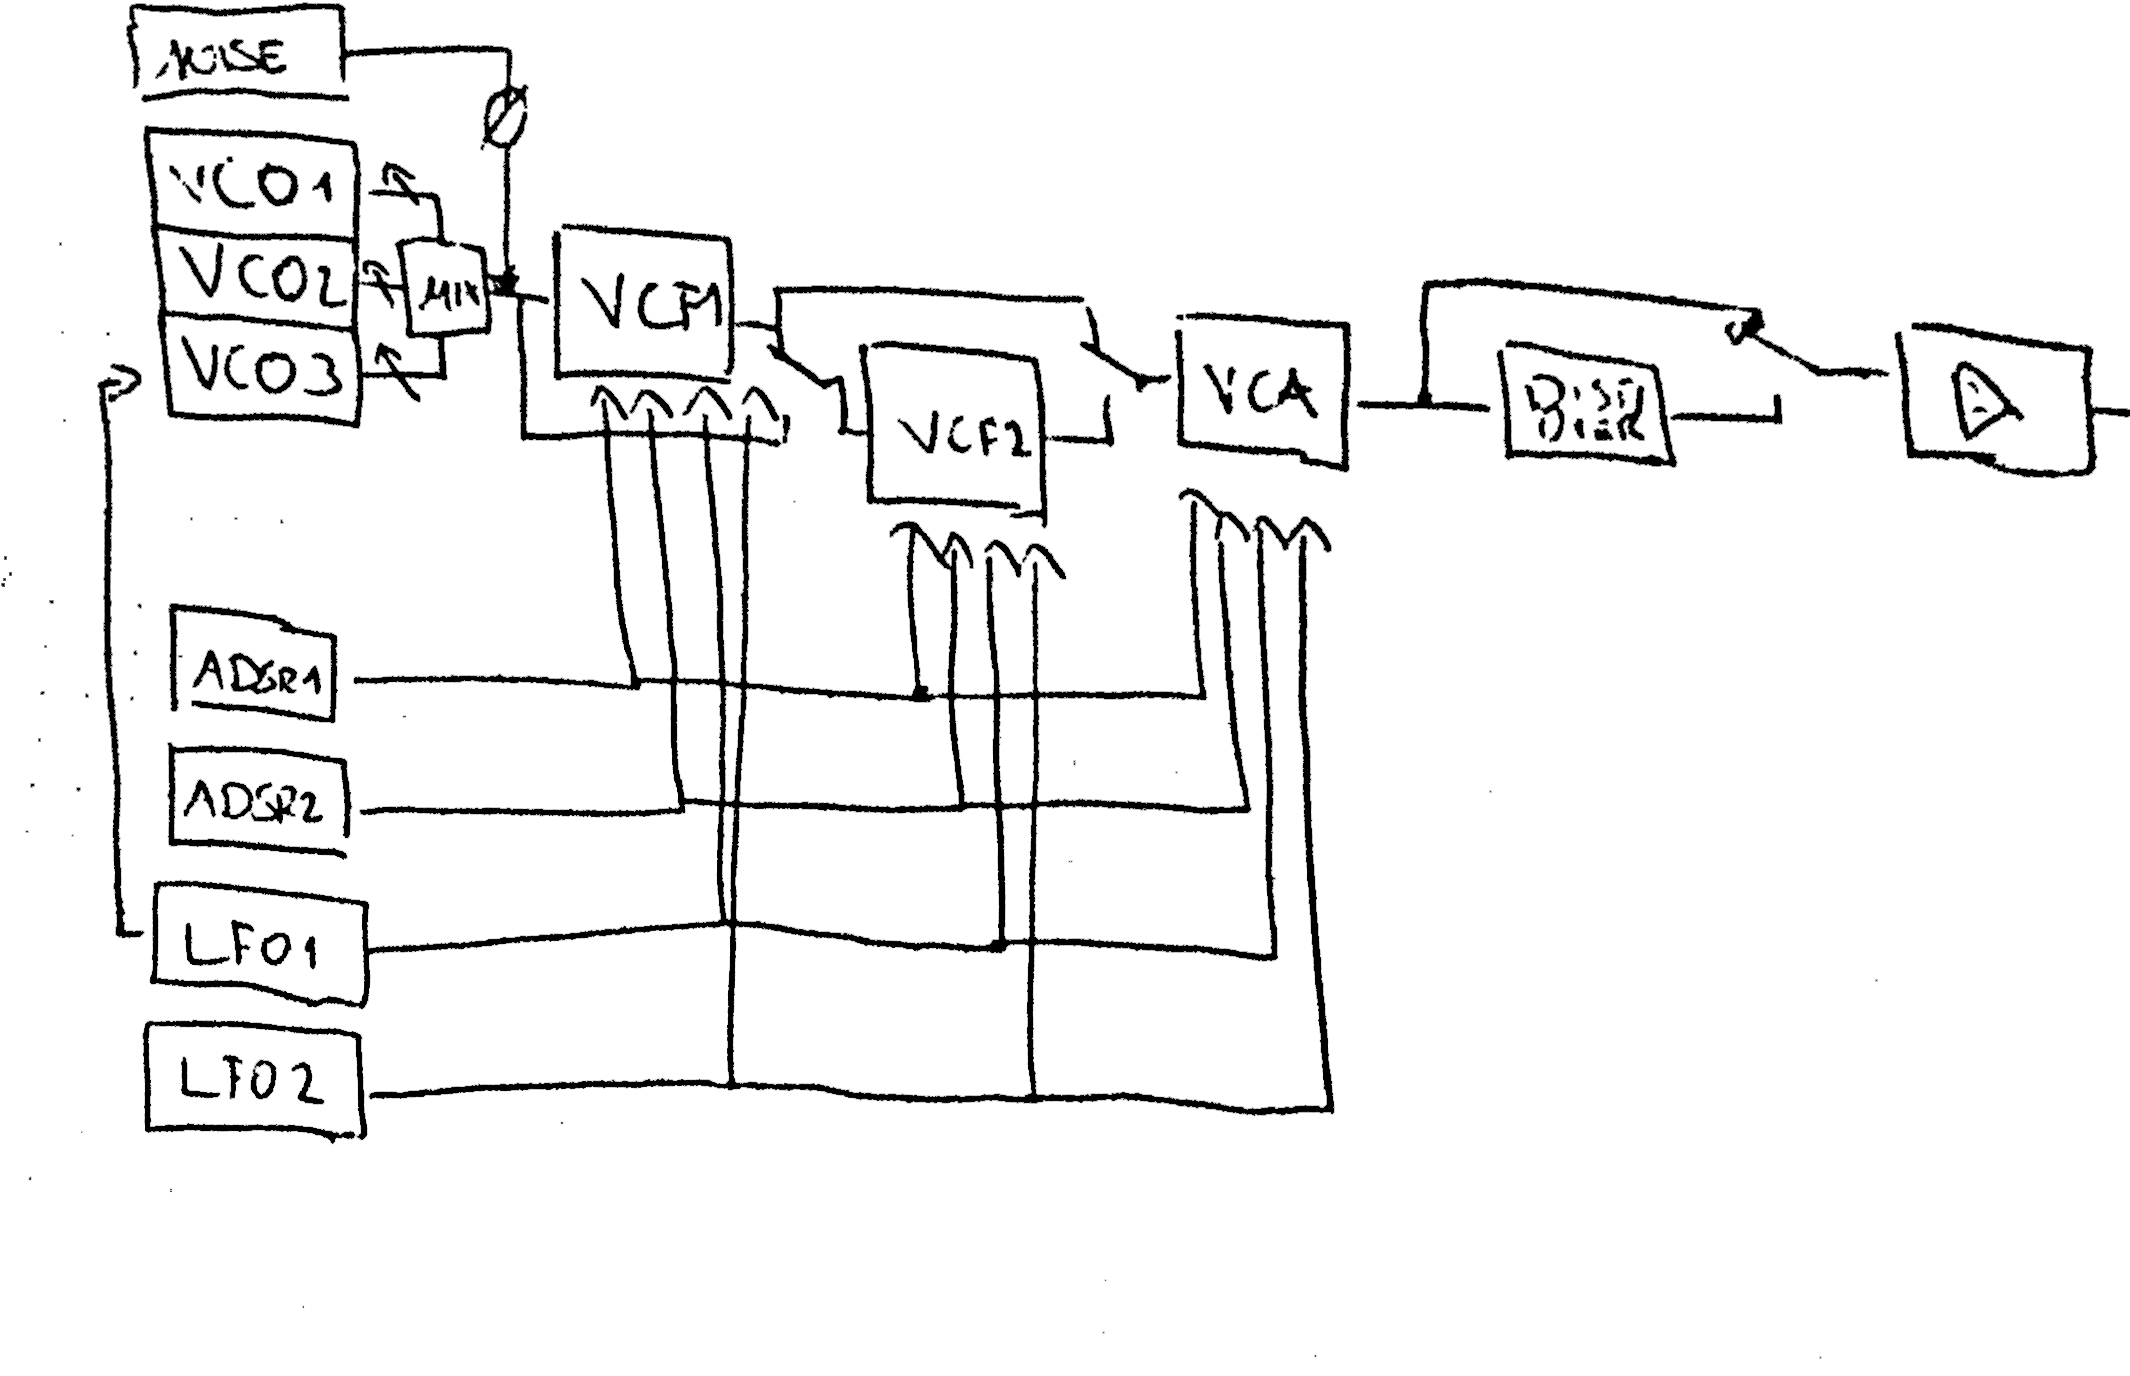 Synthesizer Projekt Blackbacklp Wiring Diagram Erste Plne Zum Aufbau Des Synthesizers